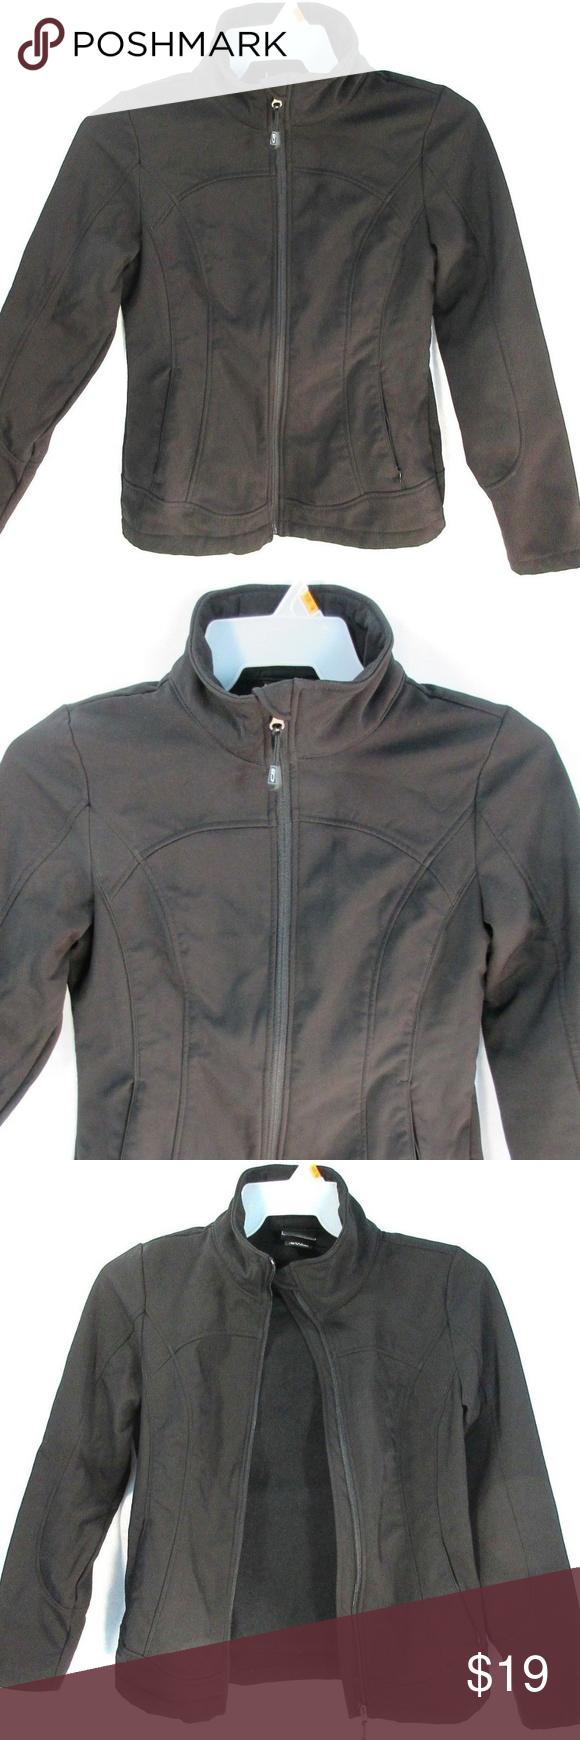 2018b675add CB Sports Women s Athletic Sports Jacket Small CB Sports Women s Athletic  Sports Jacket Size S Black